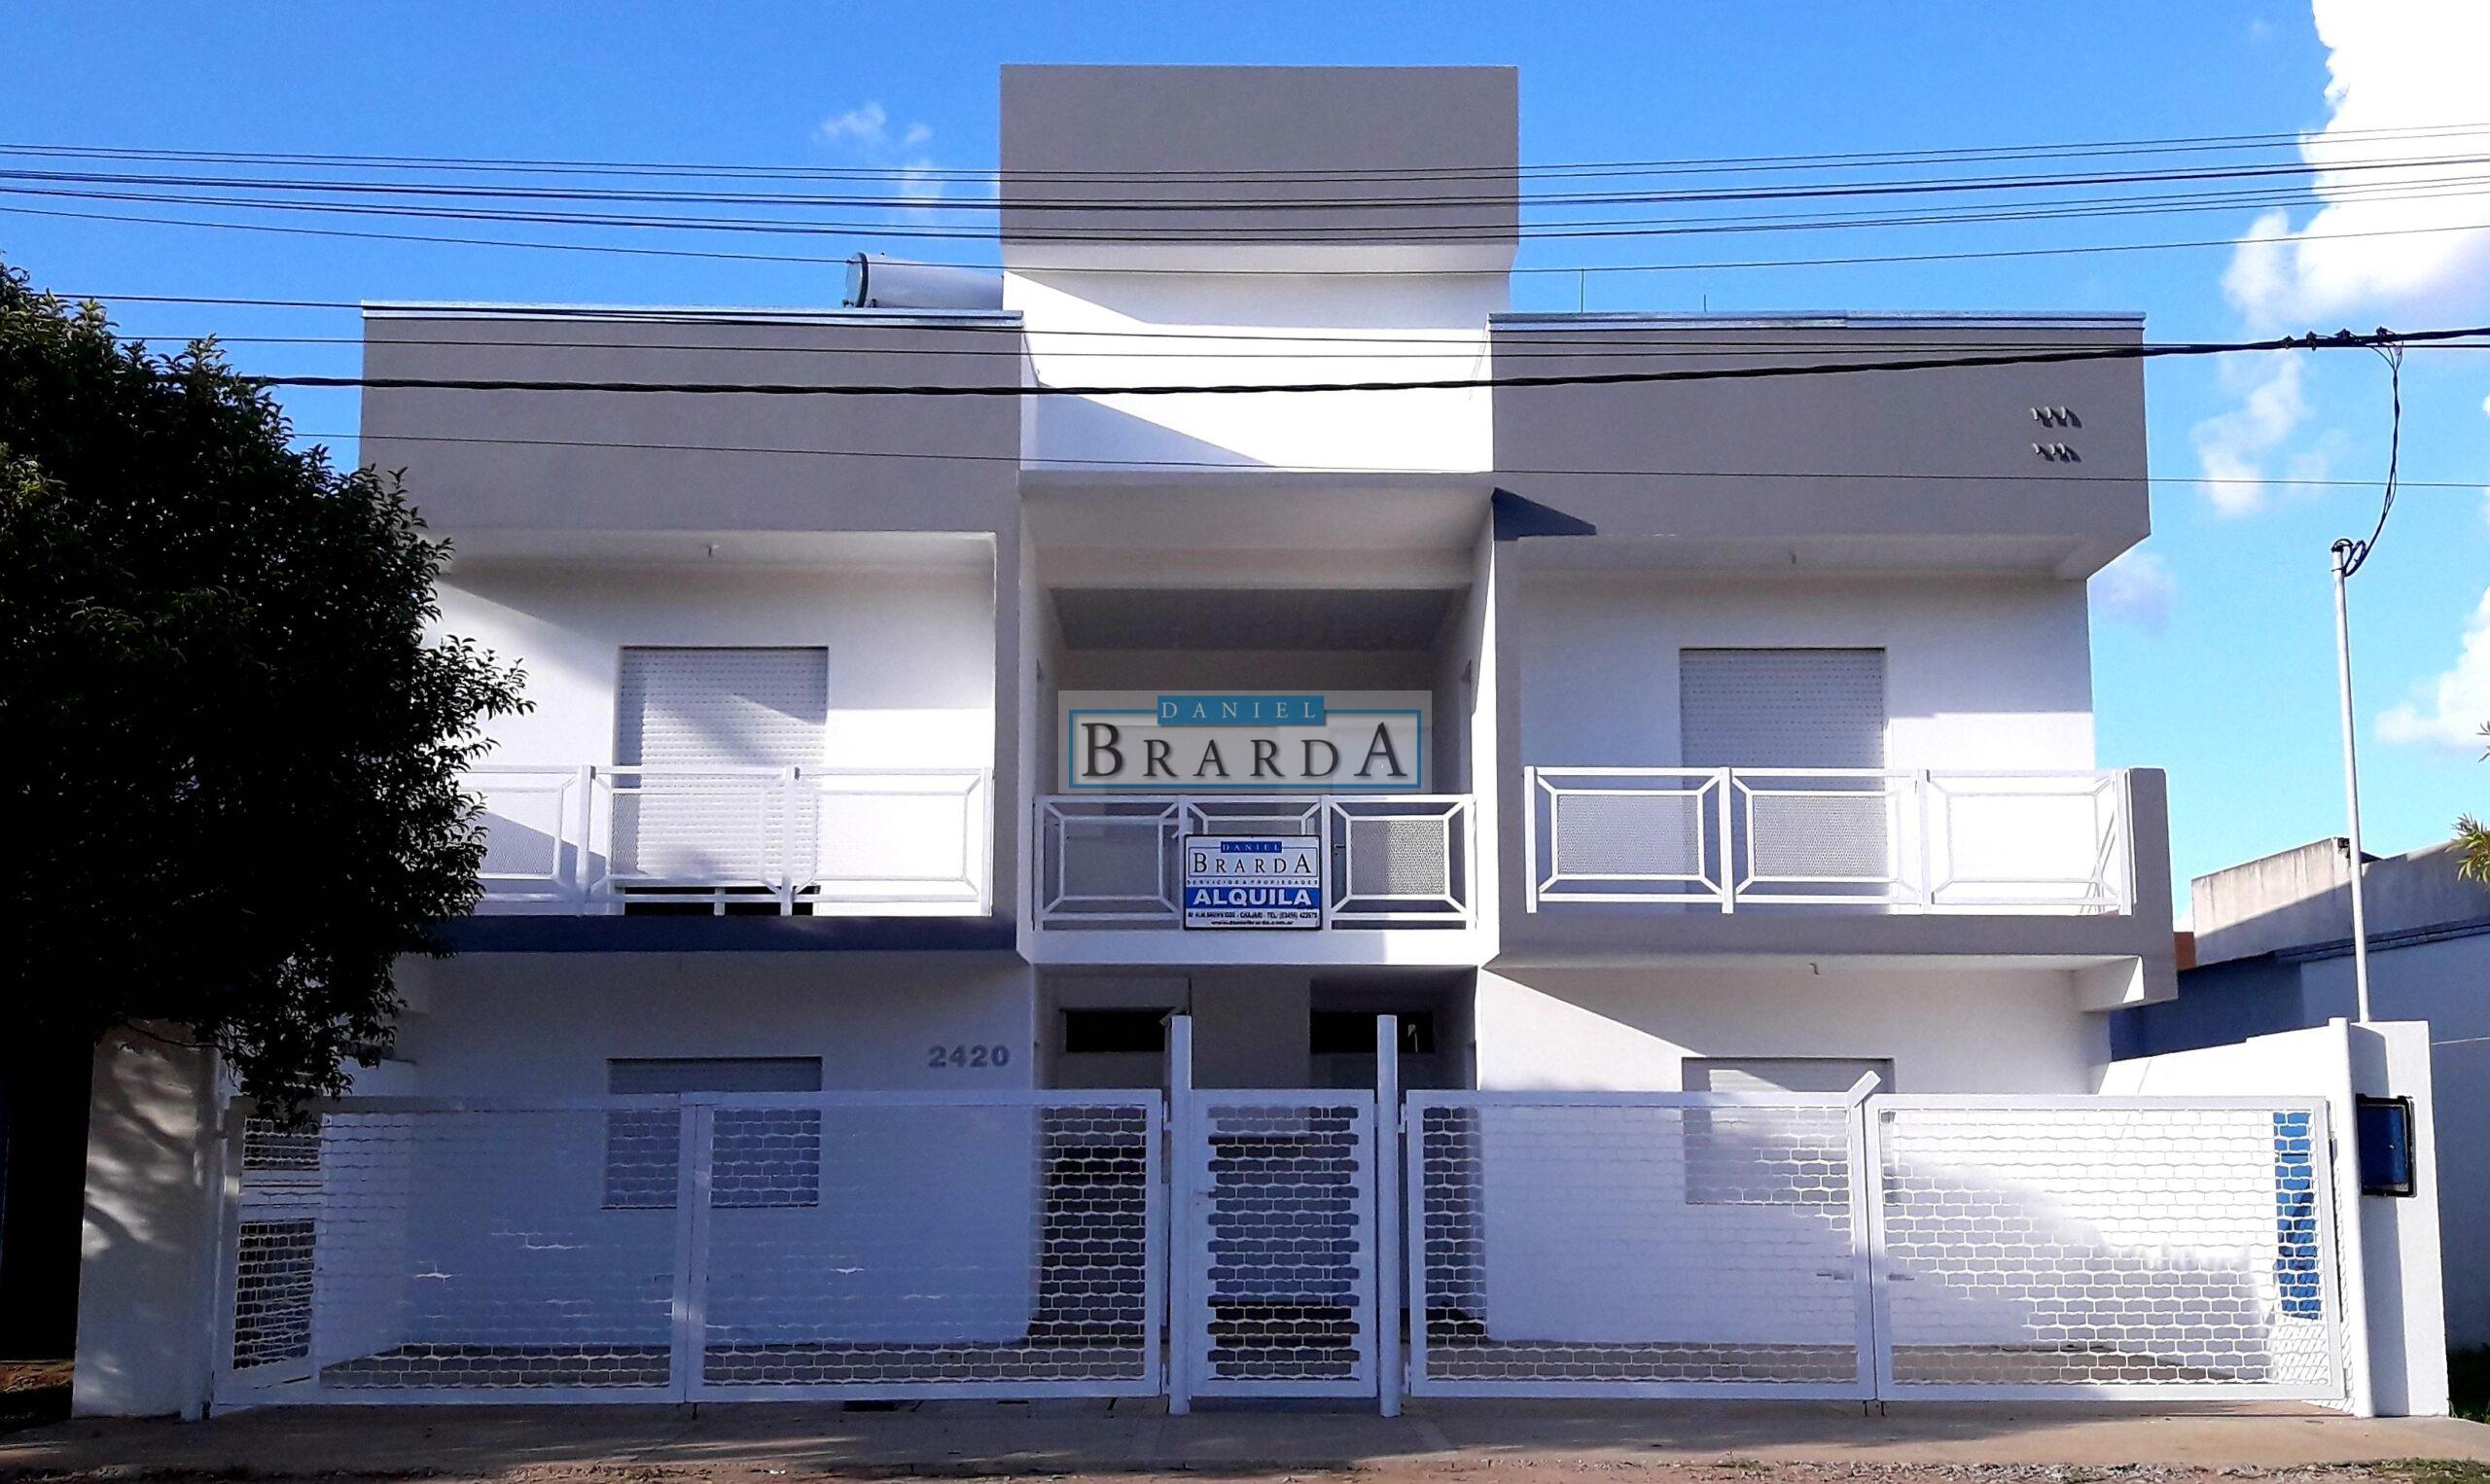 Departamento 3 (1 dormitorio) – Alte. Brown 2420 Chajari (ER)